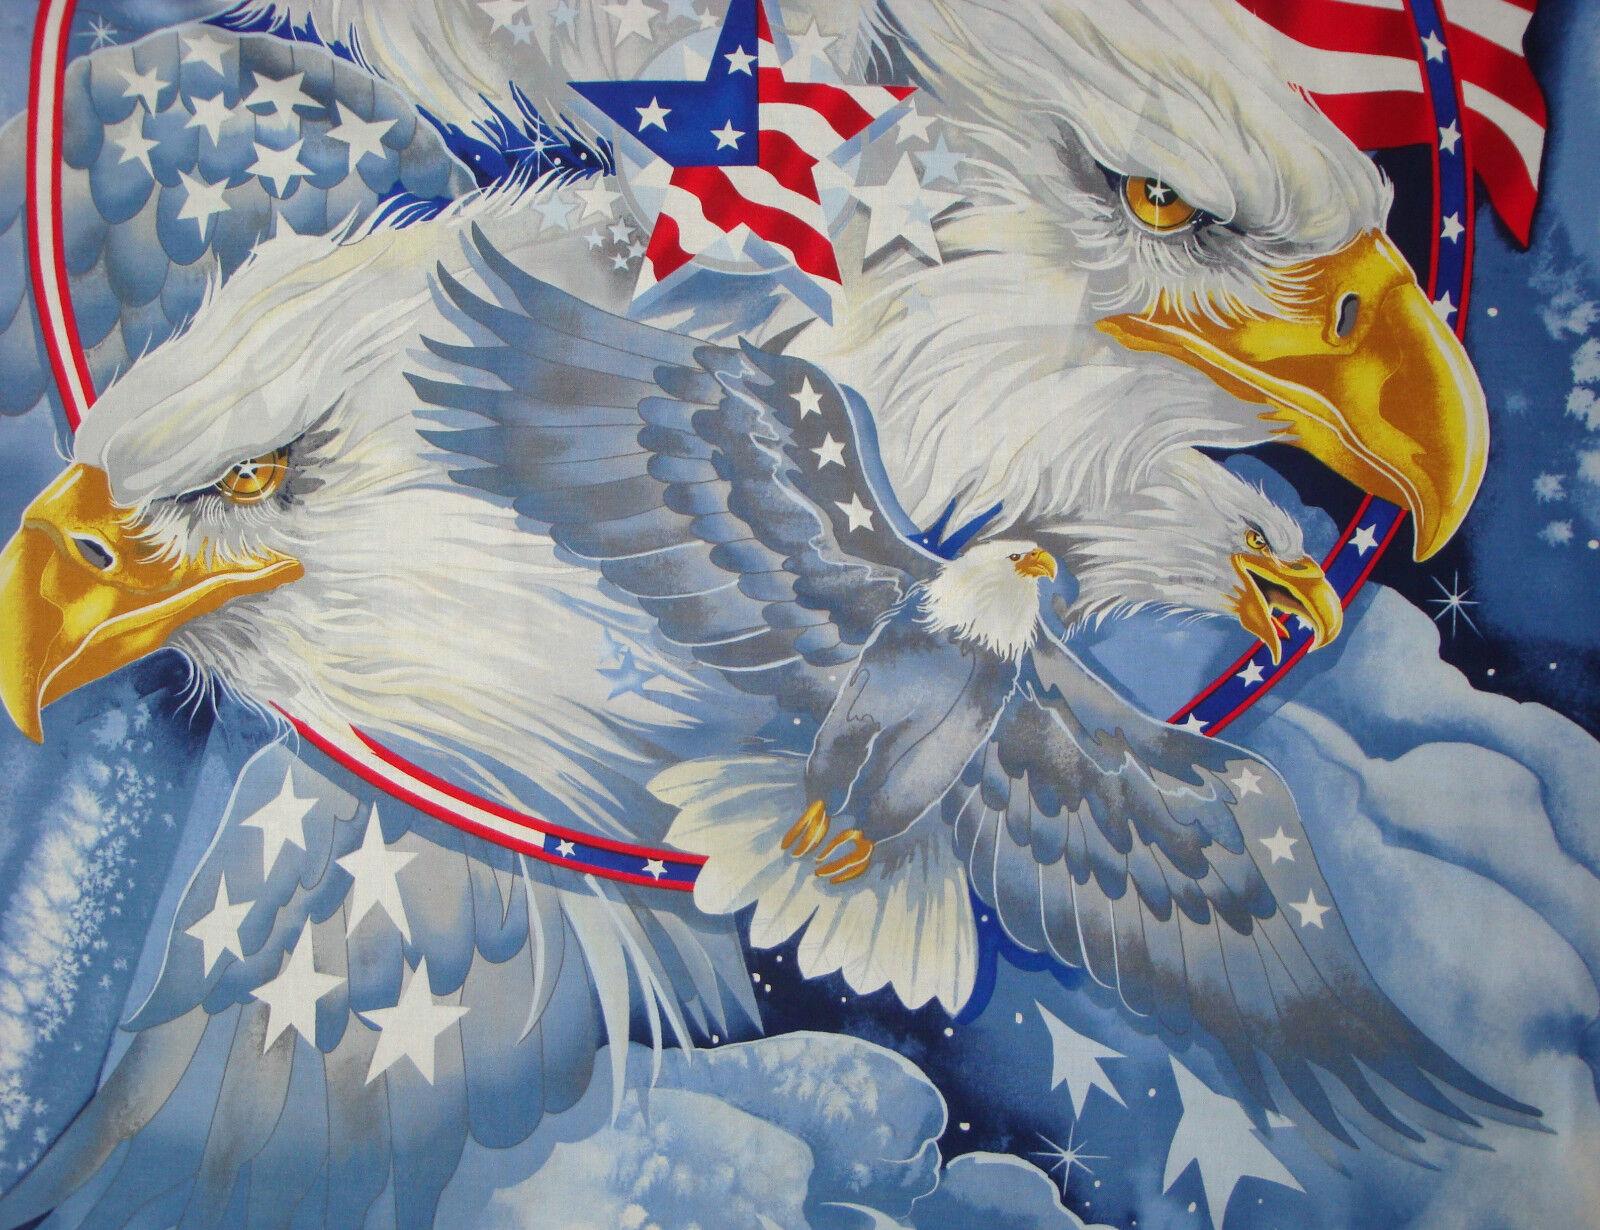 1-yd Eagle Fabric Panel Print Concepts 9//11 Tribute Veteran Quilt of Valor QOV